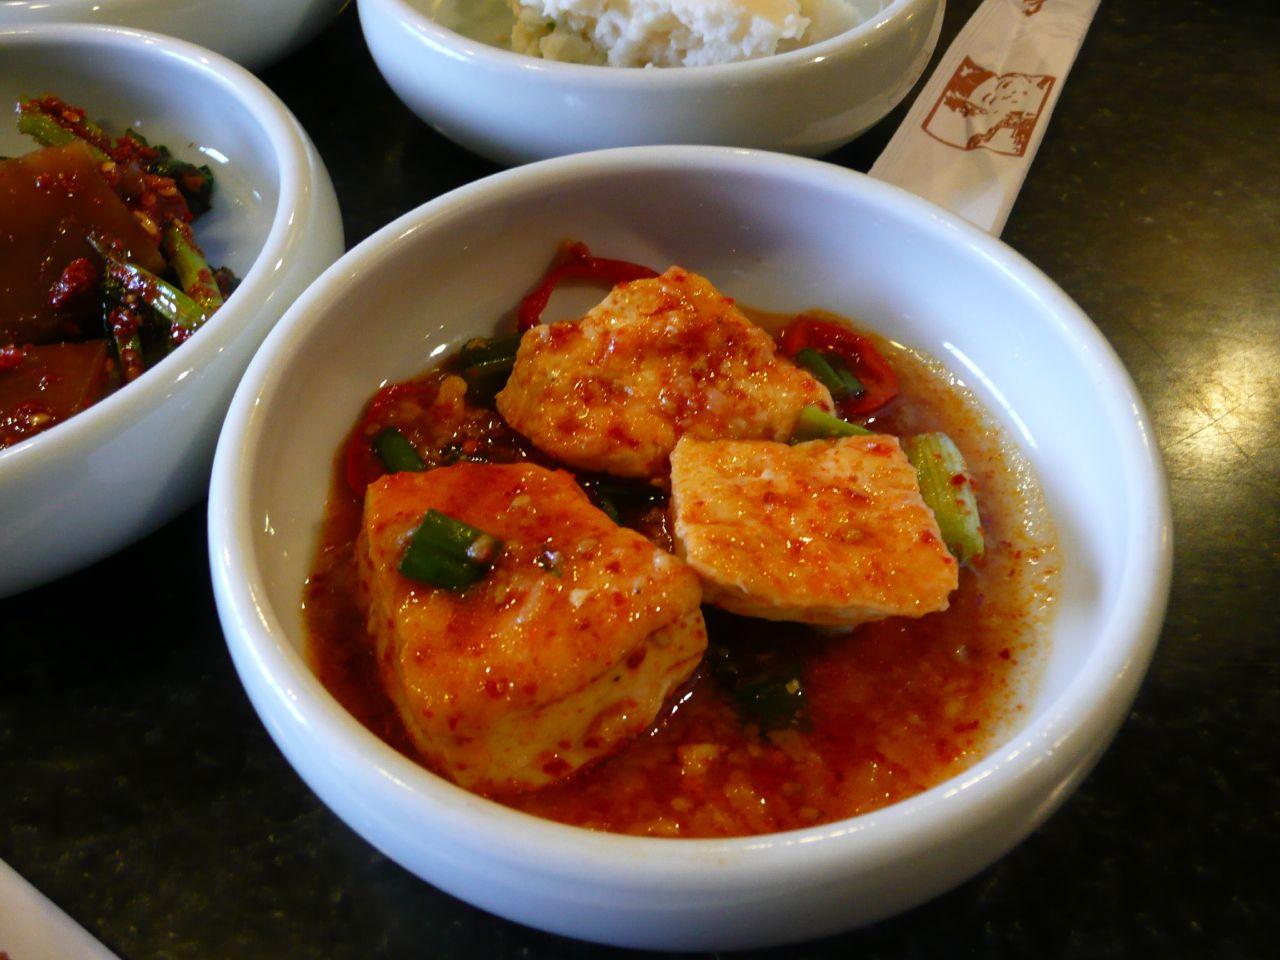 File:Korean cuisine-Dubu jorim-01.jpg - Wikimedia Commons